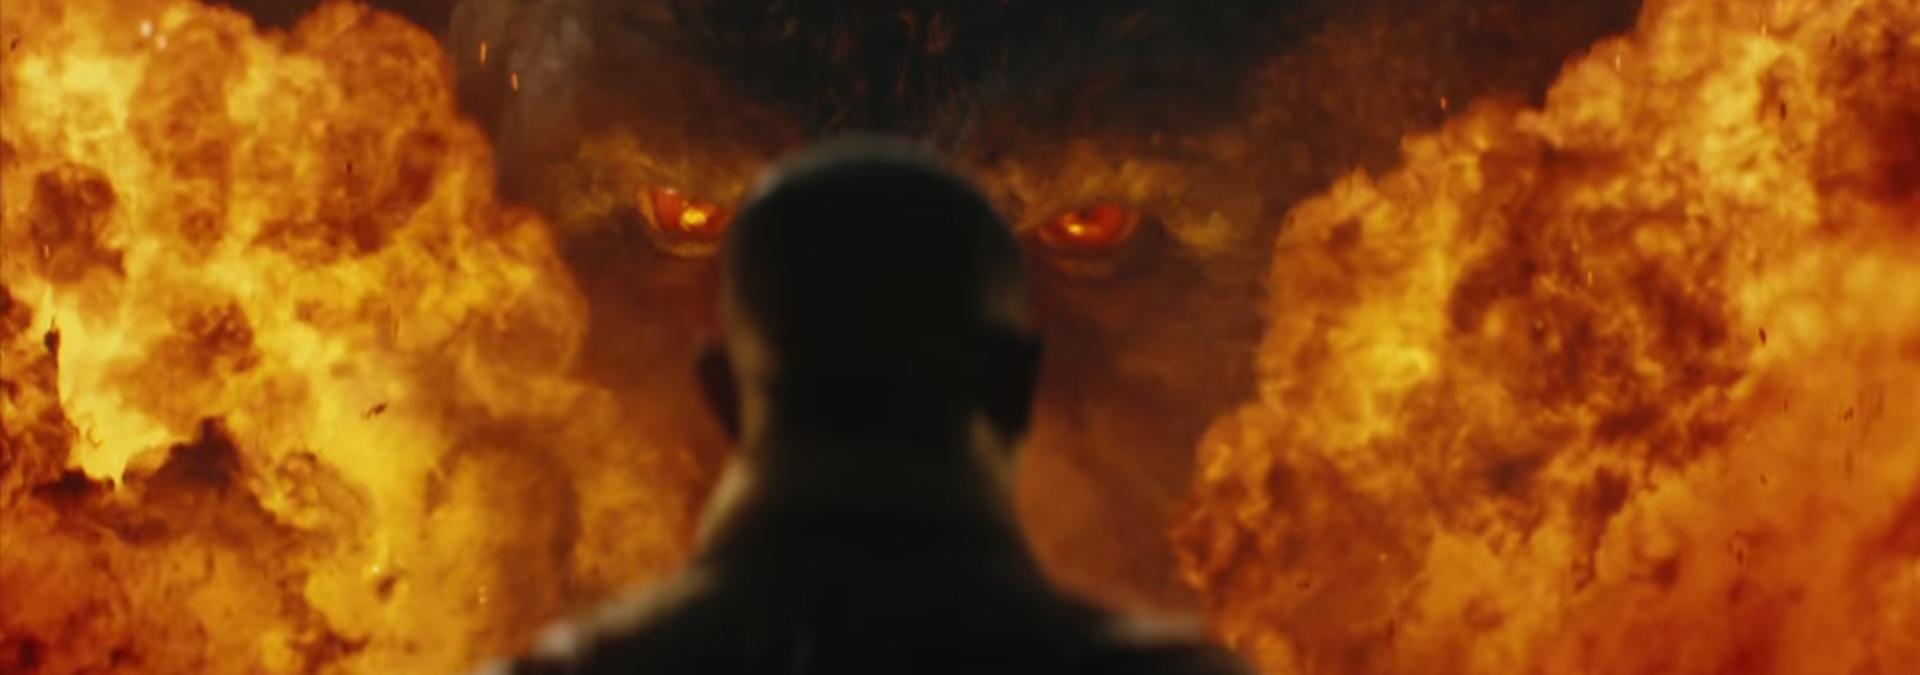 Kong: Skull Island. Image Credit: Warner Bros.